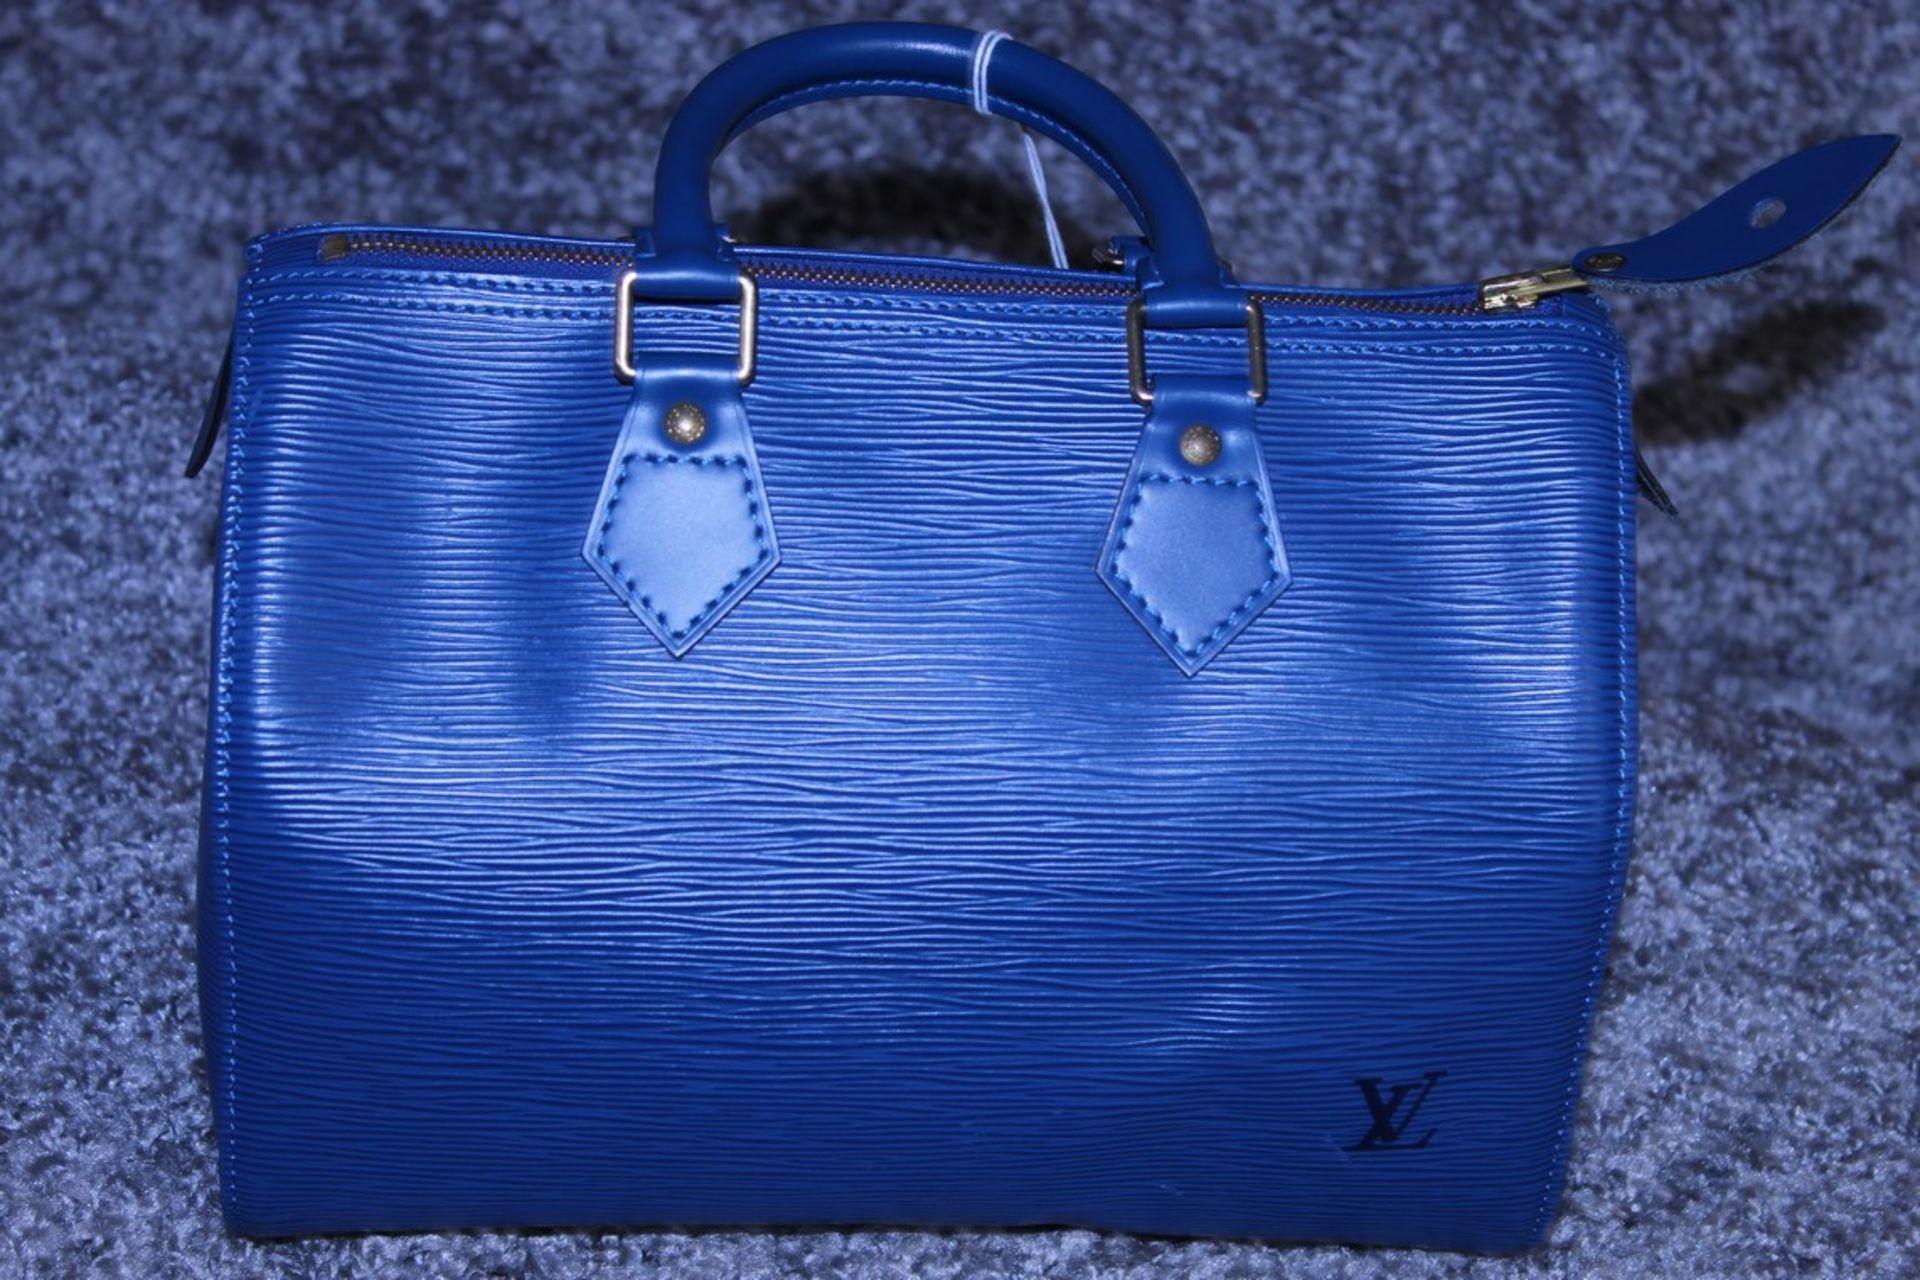 RRP £1,000 Louis Vuitton Speedy 25 Handbag, Blue Epi Calf Leather, 27X19X15Cm (Production Code - Image 2 of 5